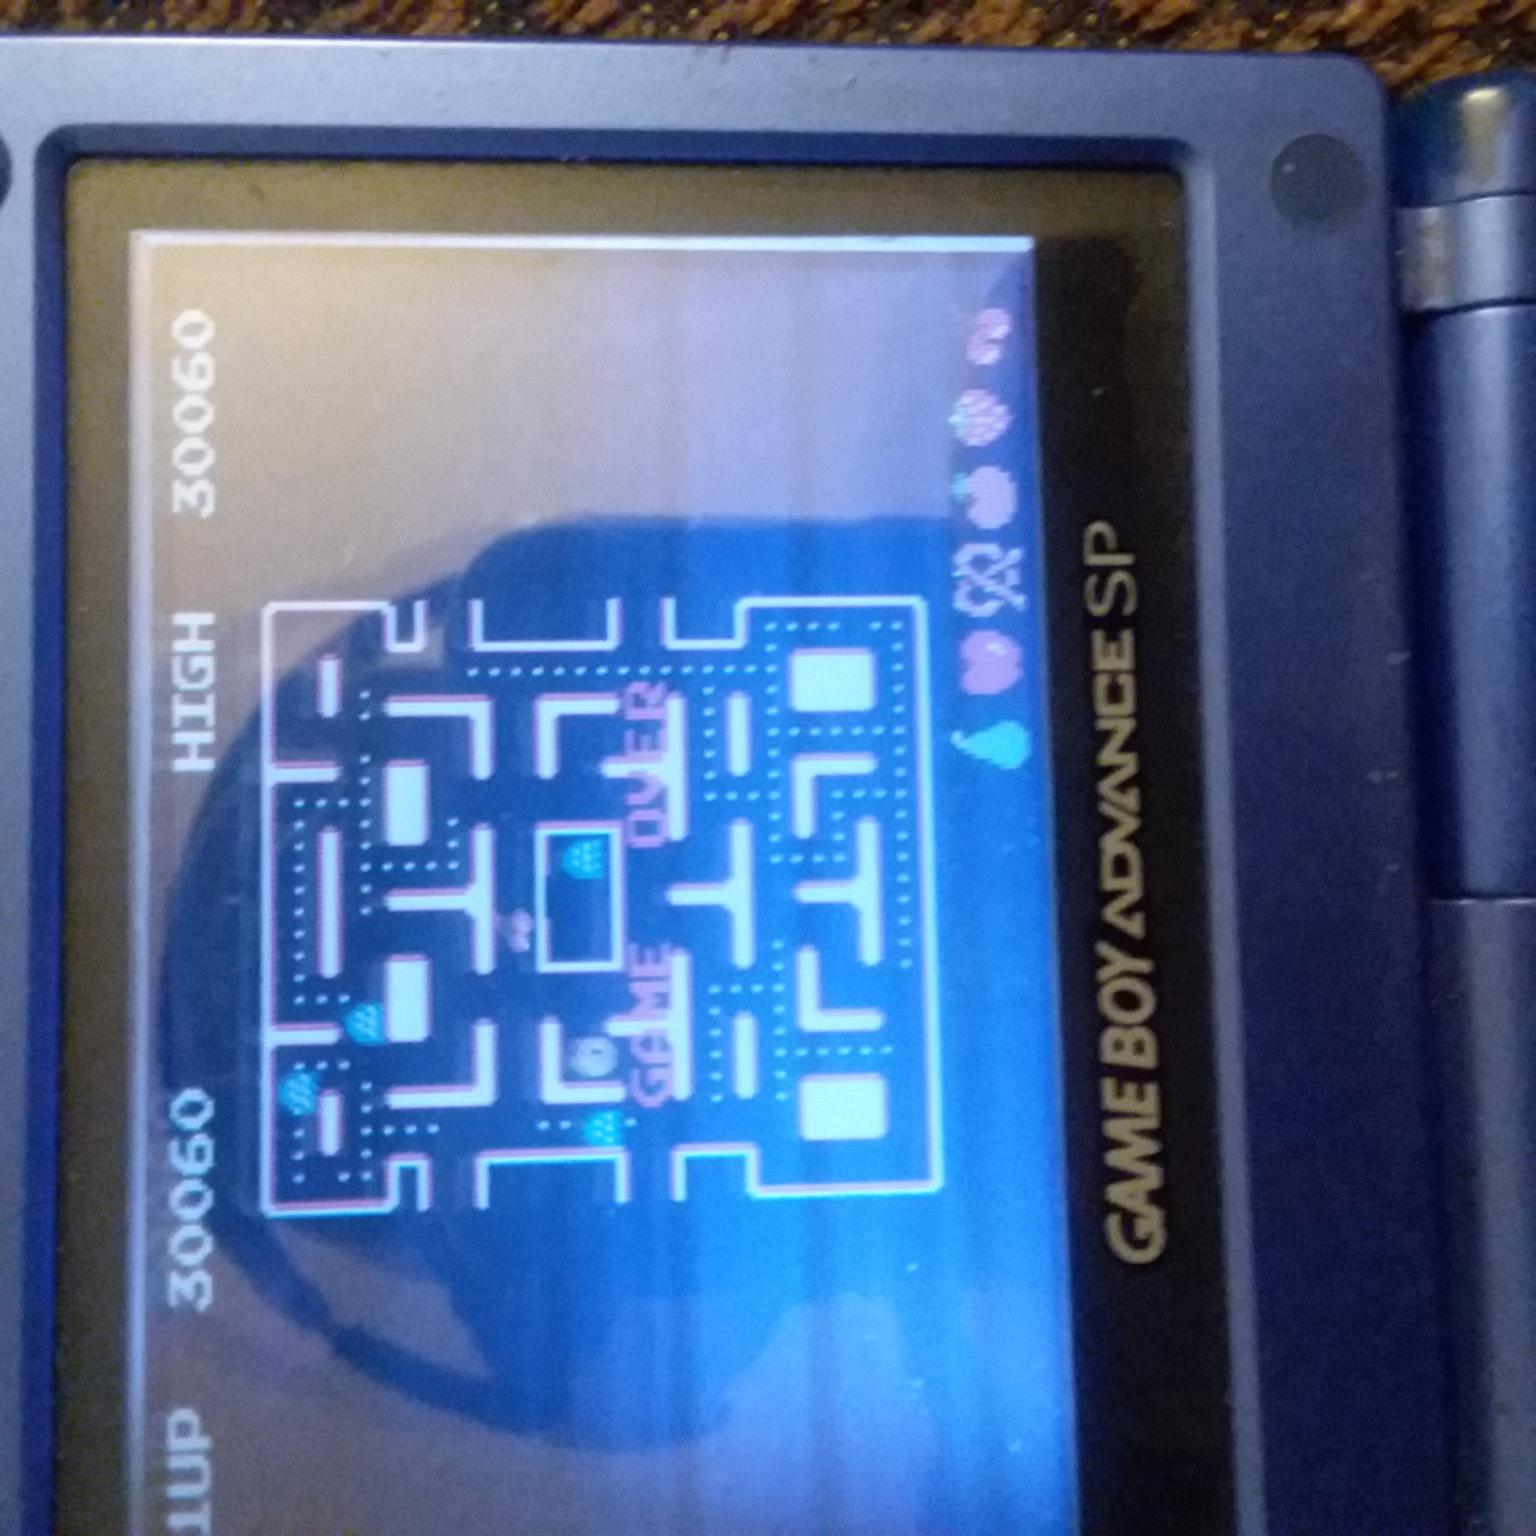 Hauntedprogram: Namco Museum: Ms. Pac-Man (GBA) 30,060 points on 2021-04-16 09:05:39